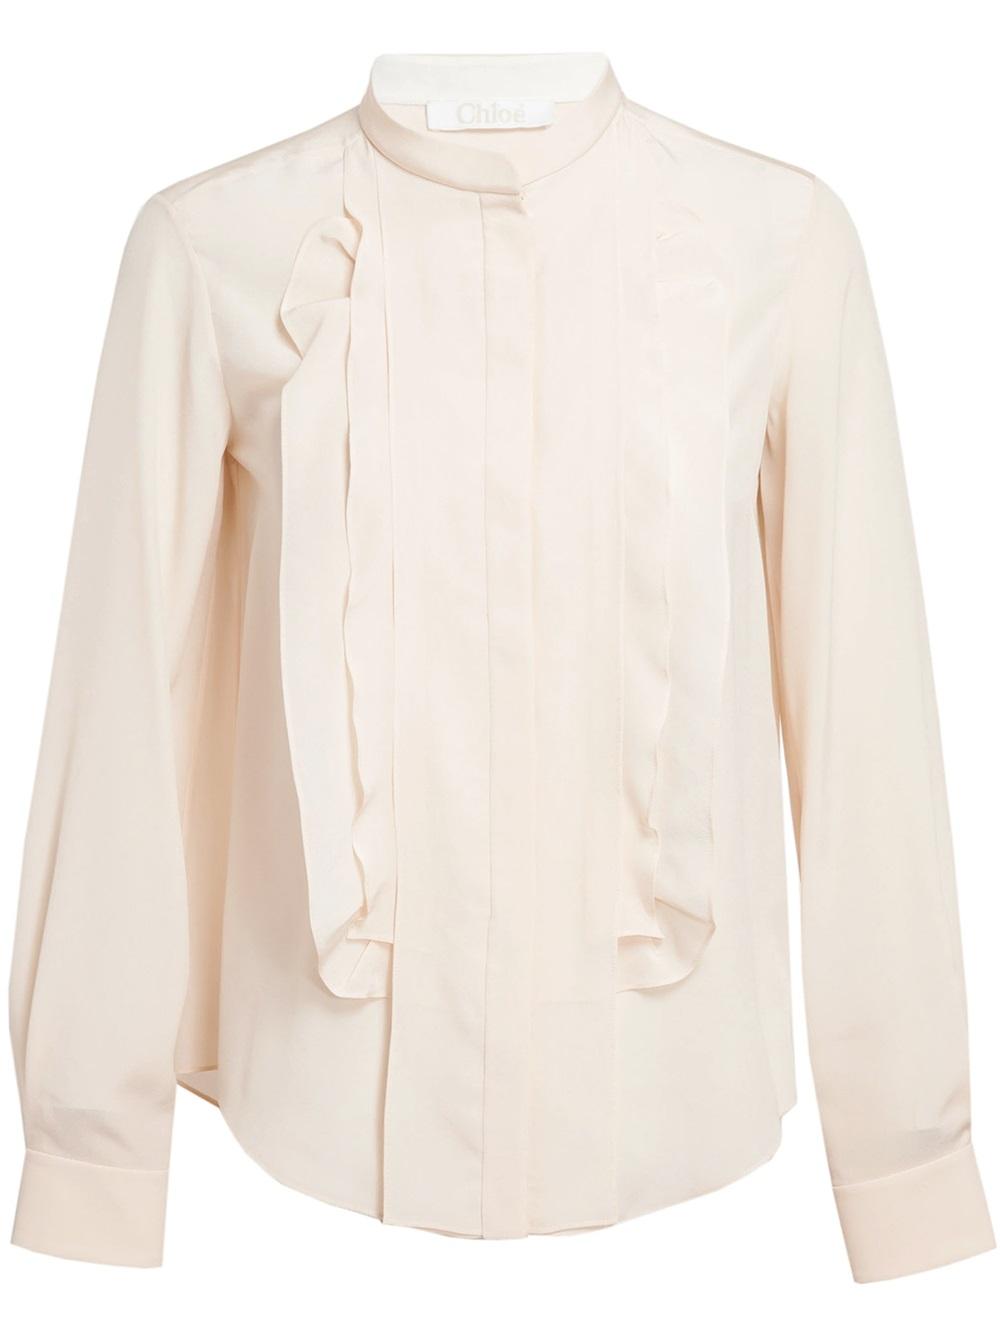 4b9fb1513de50 Lyst - Chloé Ruffle Placket Silk Shirt in Natural